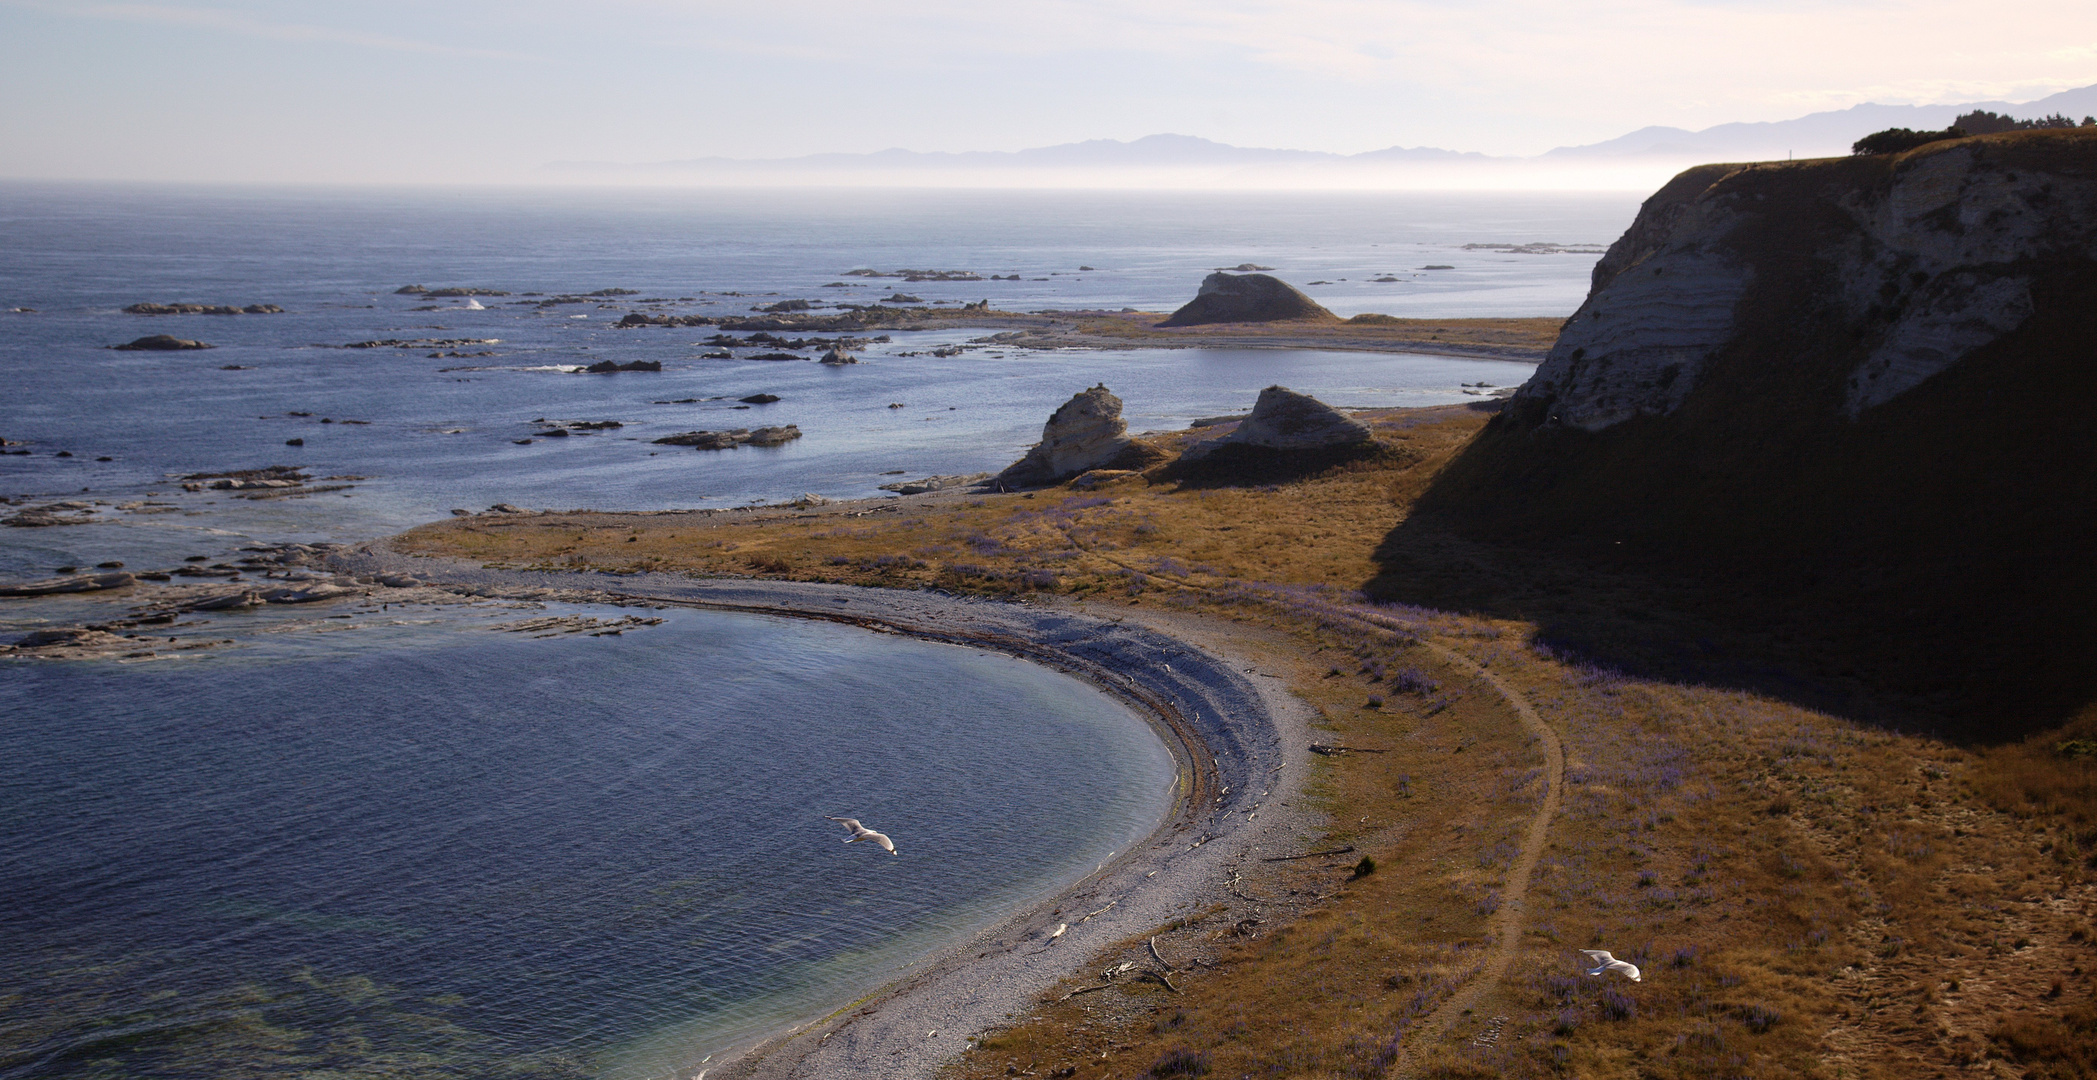 Whalers Bay (Kaikoura Peninsula Cliff Top Walk)